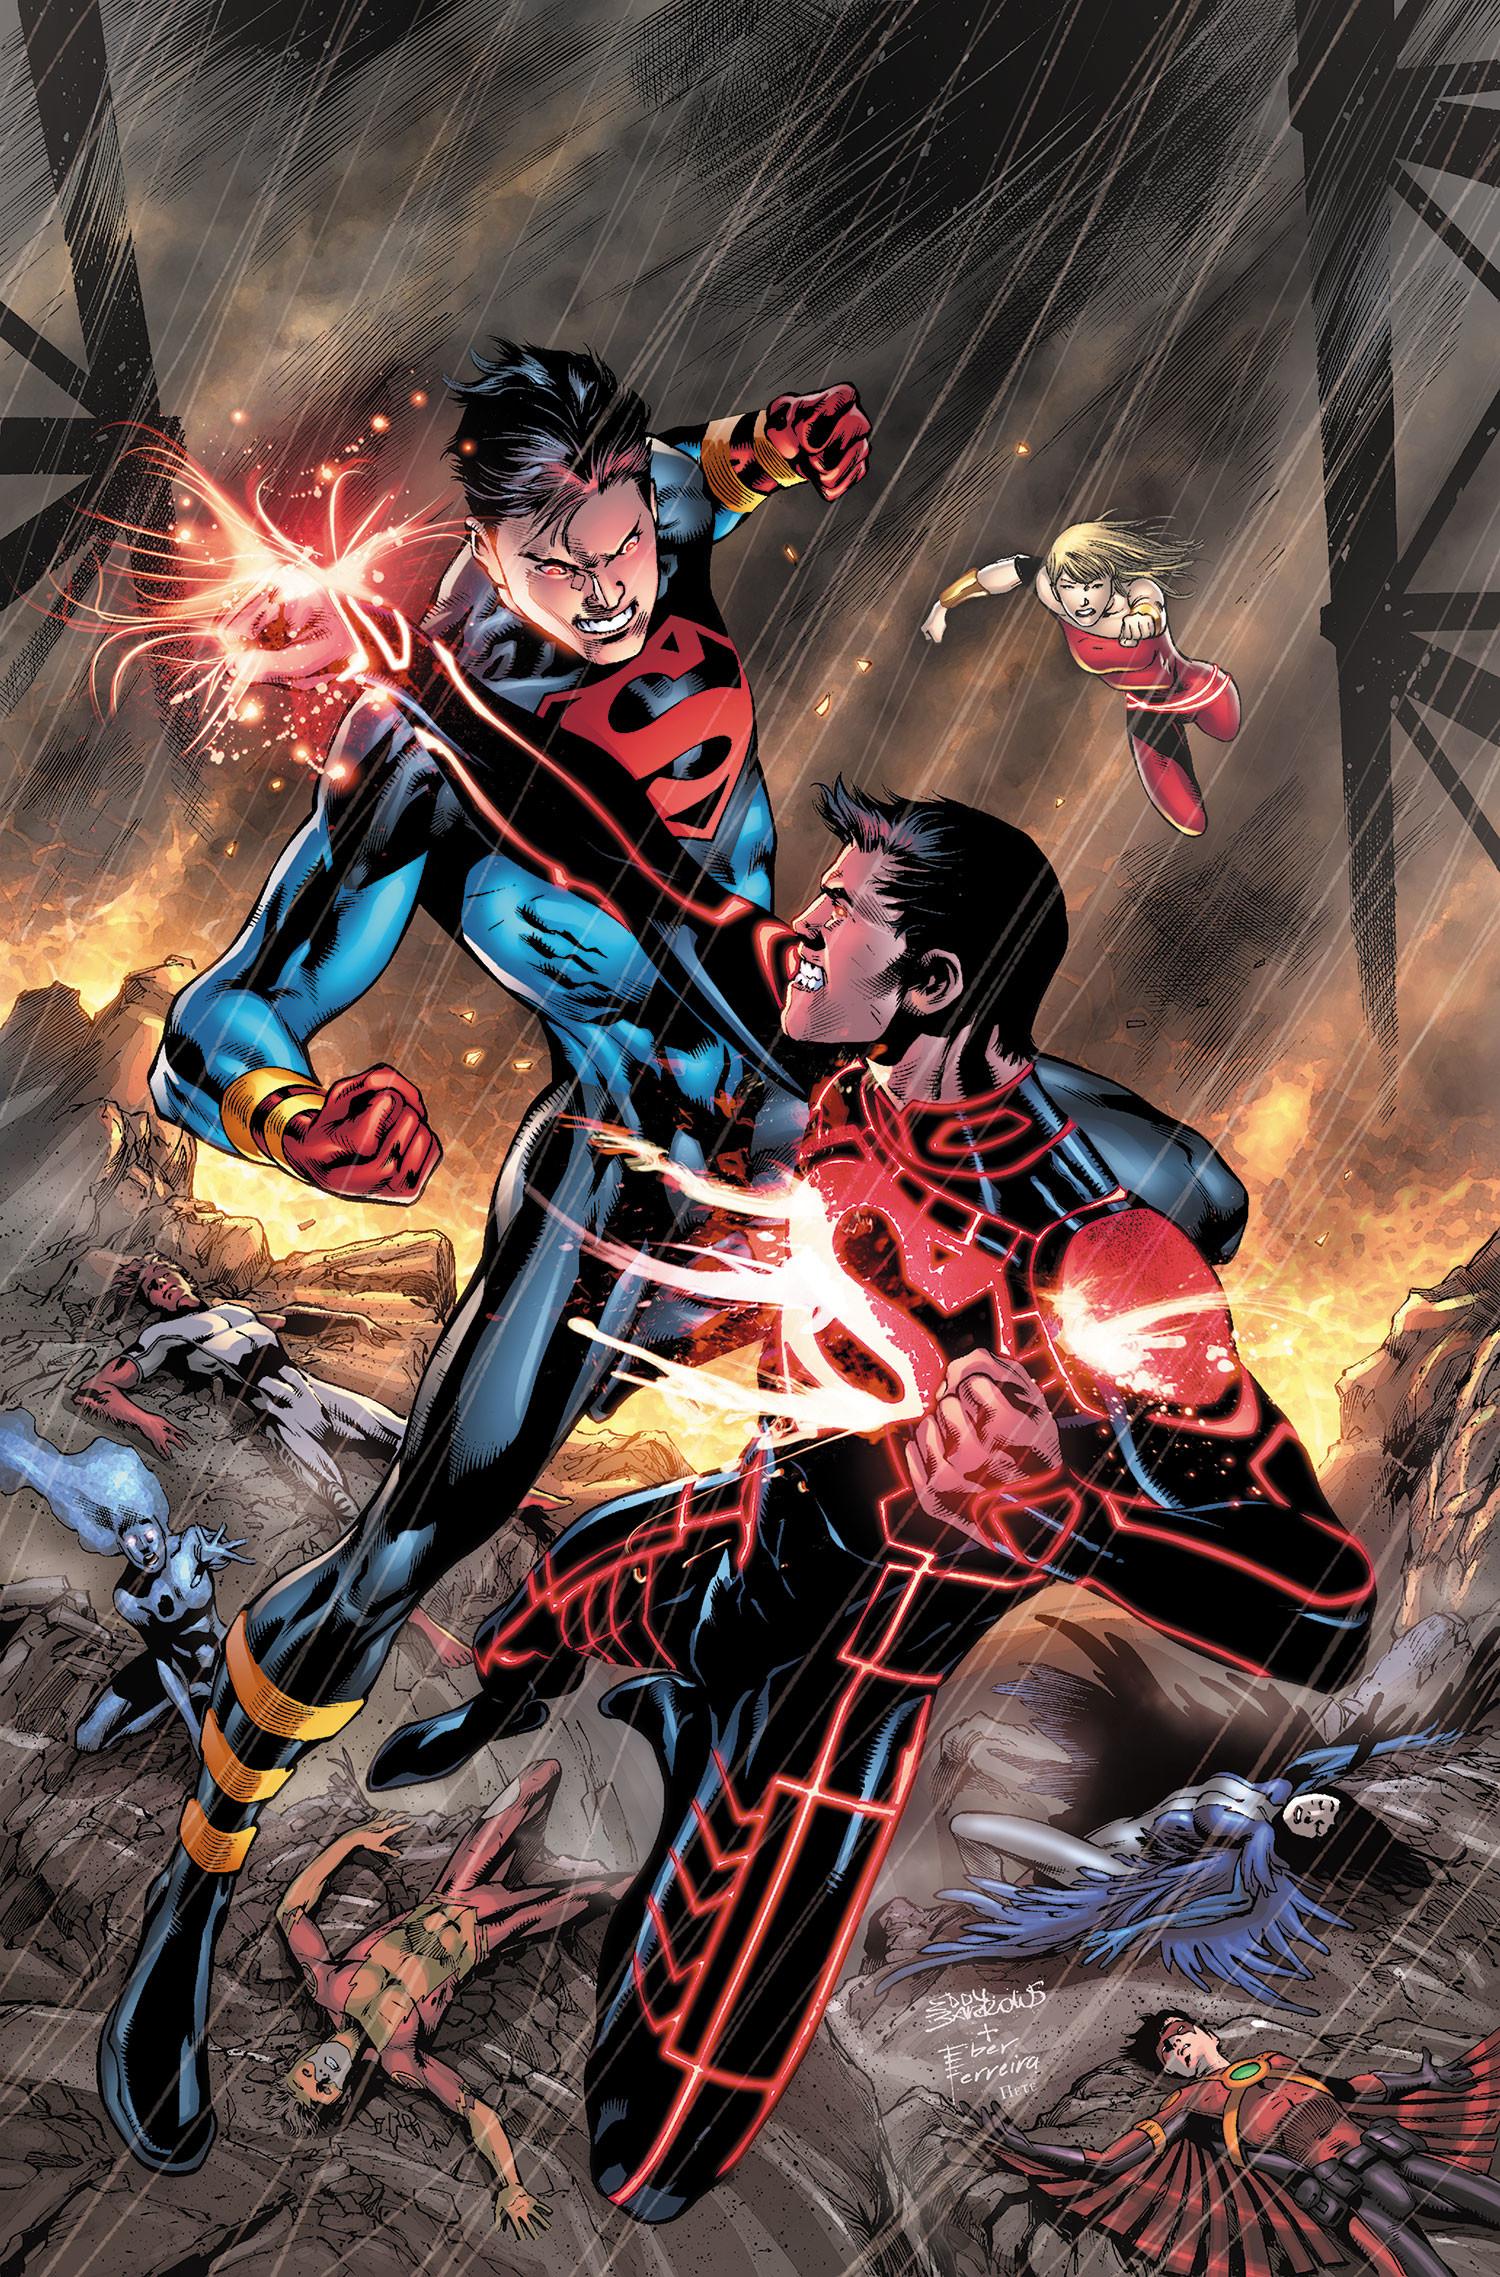 Superboy vs Grimmjow